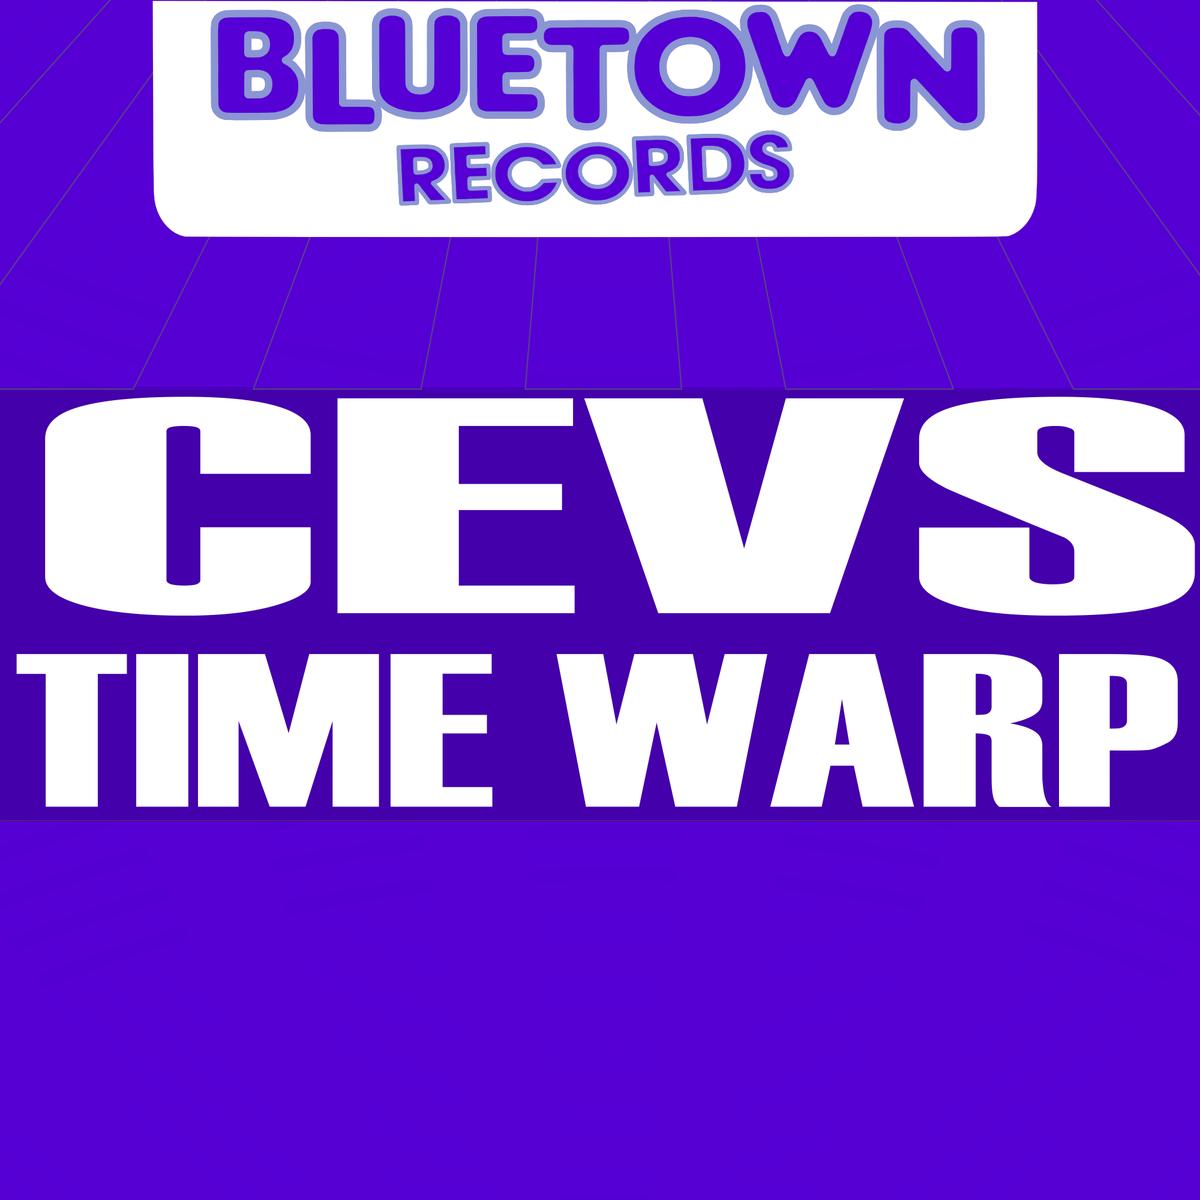 Out now! CEVs &quot;Time Warp&quot;   http://www. traxsource.com/track/3594075/ time-warp &nbsp; …  #housemusic #realhousemusic #jackinhouse<br>http://pic.twitter.com/BXKCtjqs3F